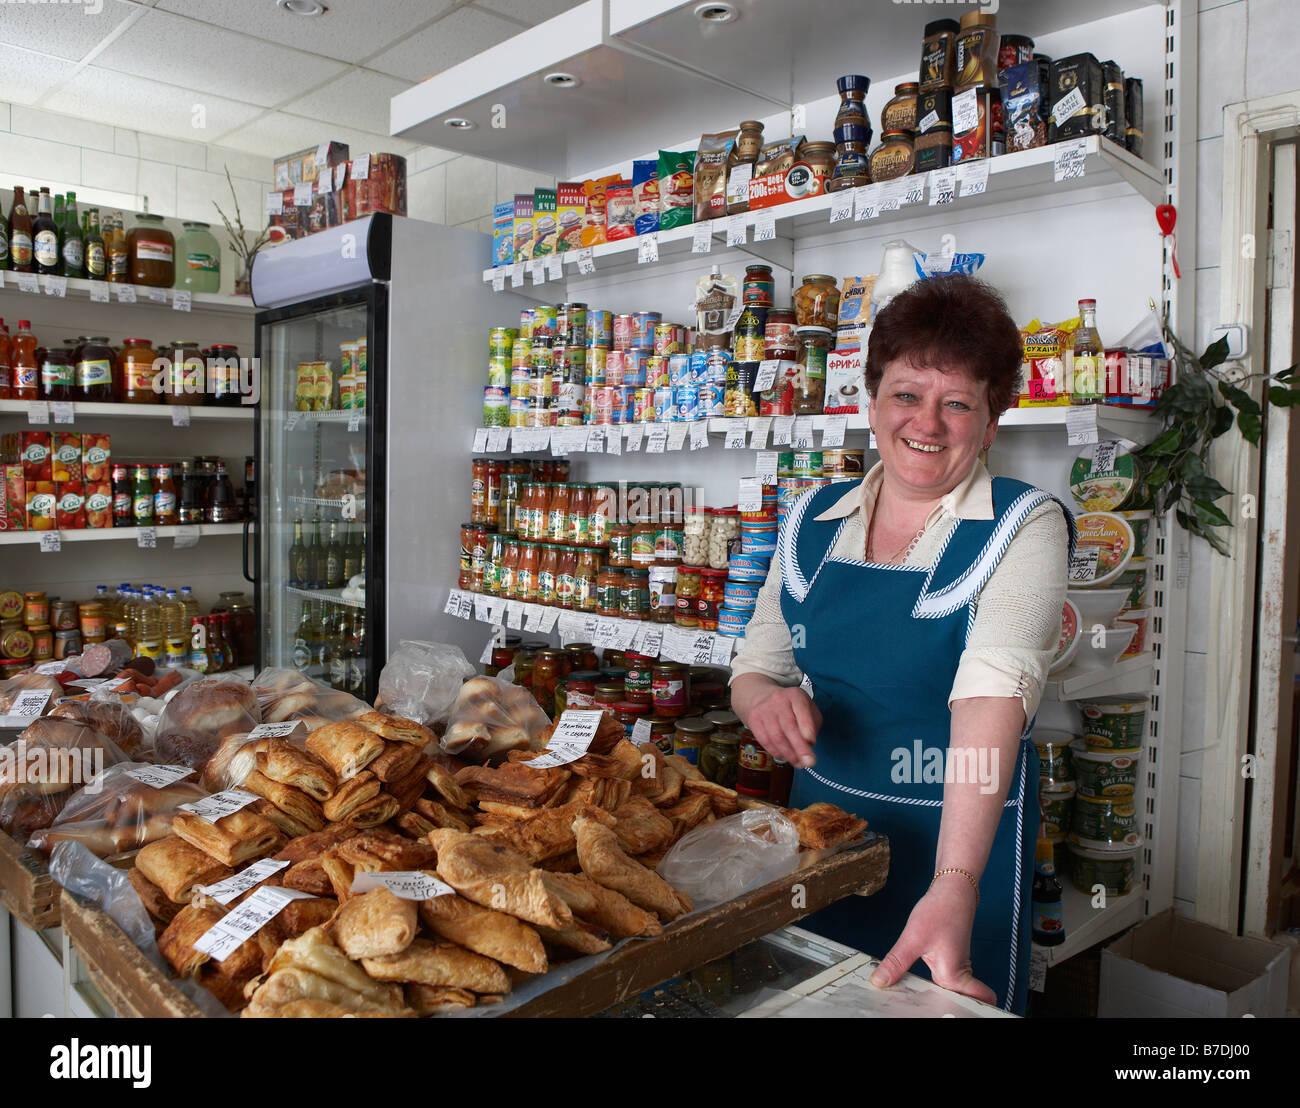 s clerk at store amguema chukotka siberia russia stock s clerk at store amguema chukotka siberia russia